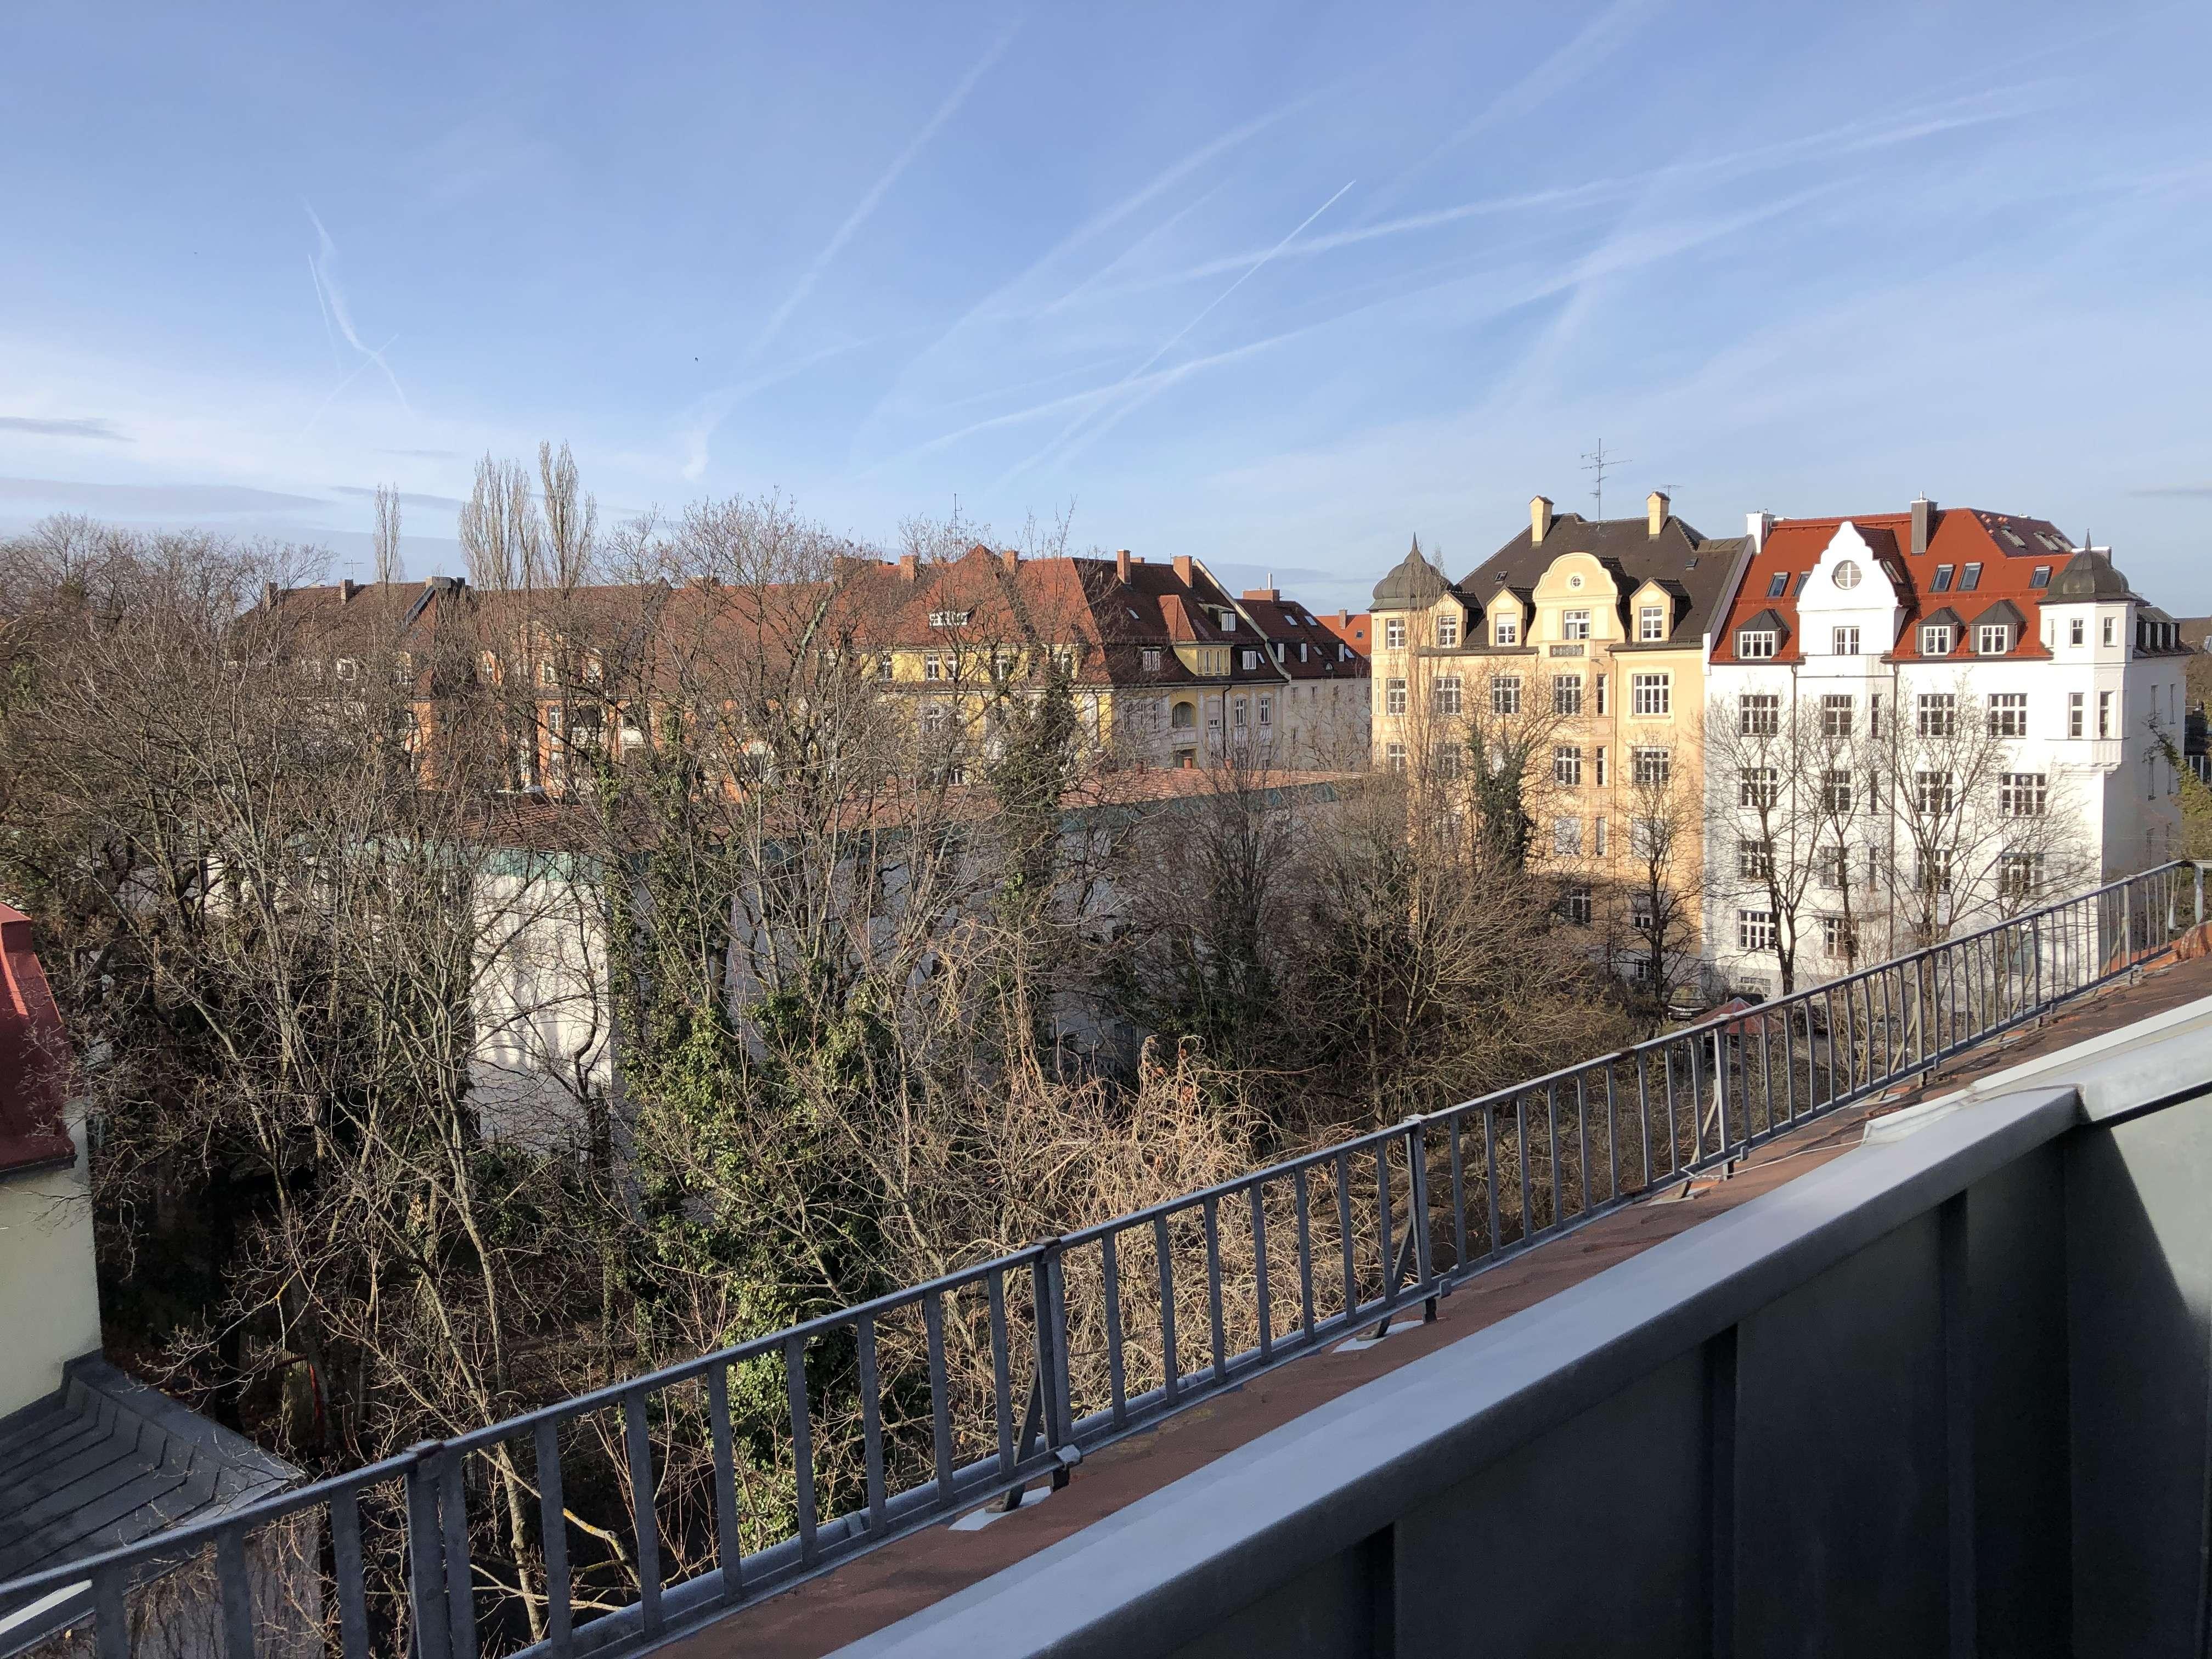 Möbliert: 2,5 Zimmer Top-Wohnung in Top-Lage Schwabing in Schwabing (München)